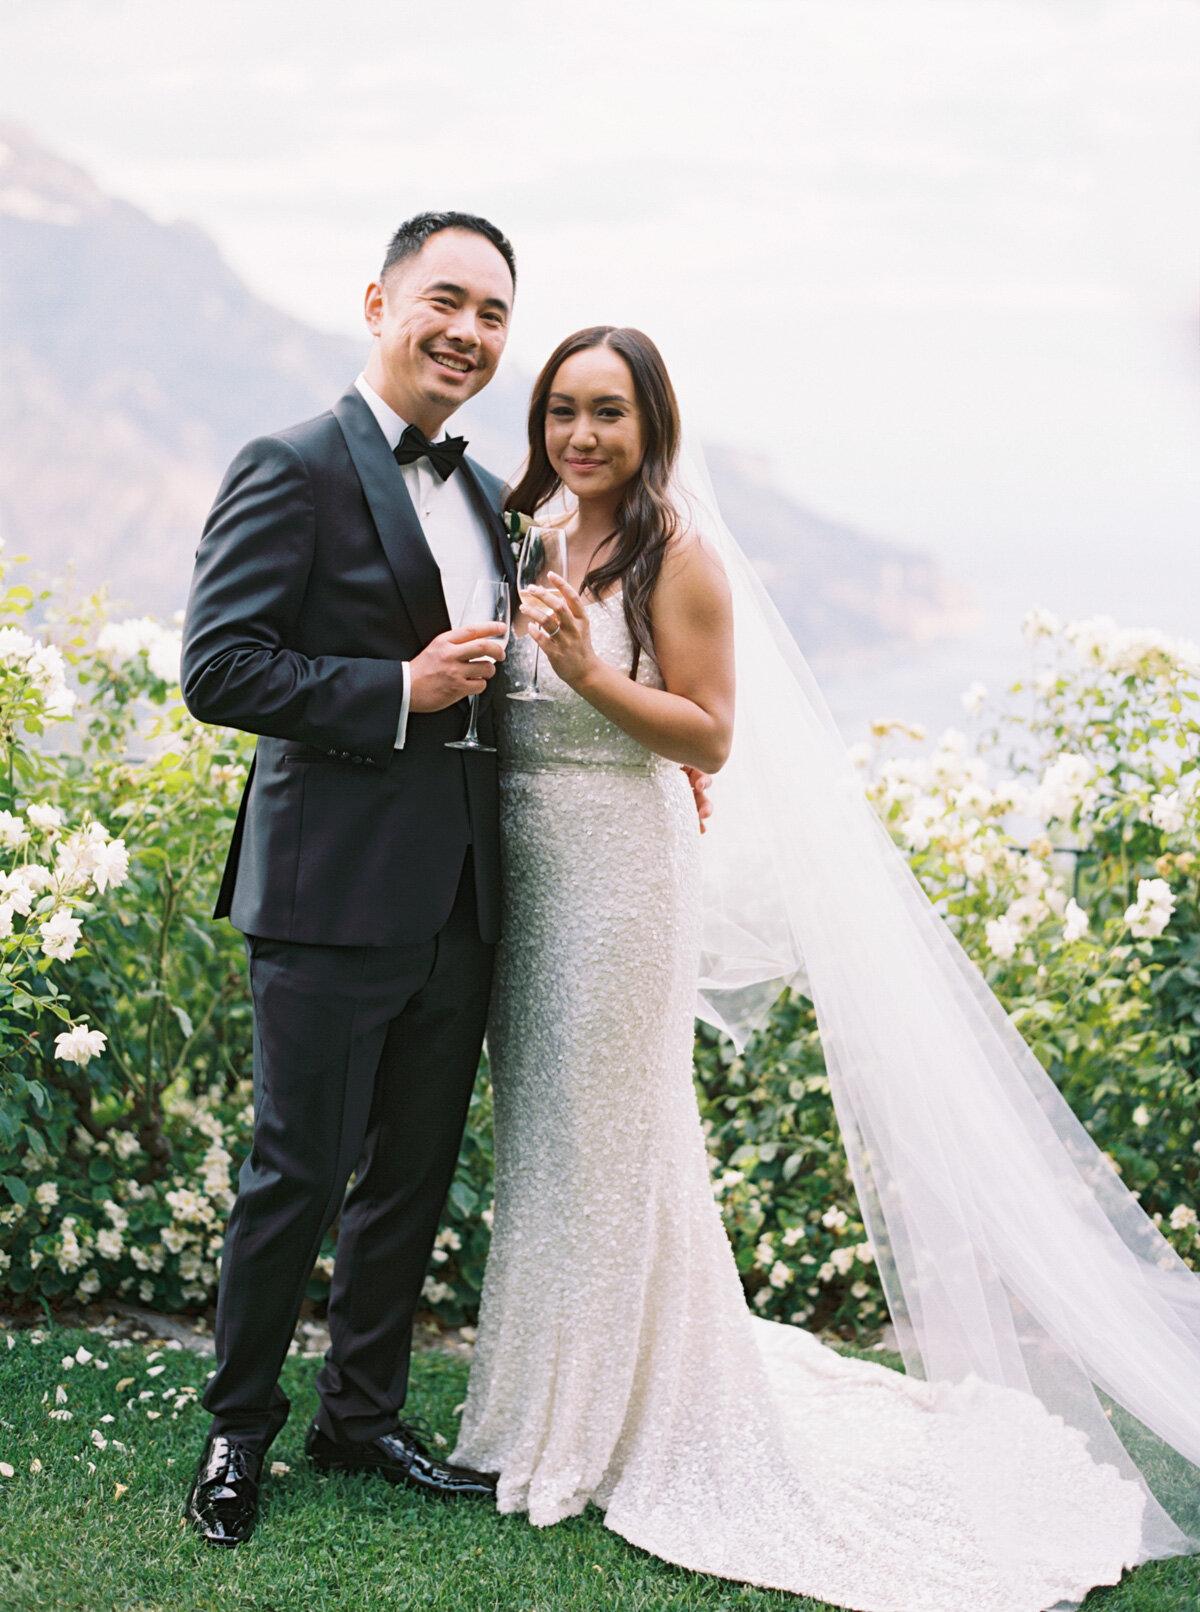 Belmond-Hotel-Caruso-ravello-elopement-Katie-Grant-destination-wedding (36 of 50).jpg